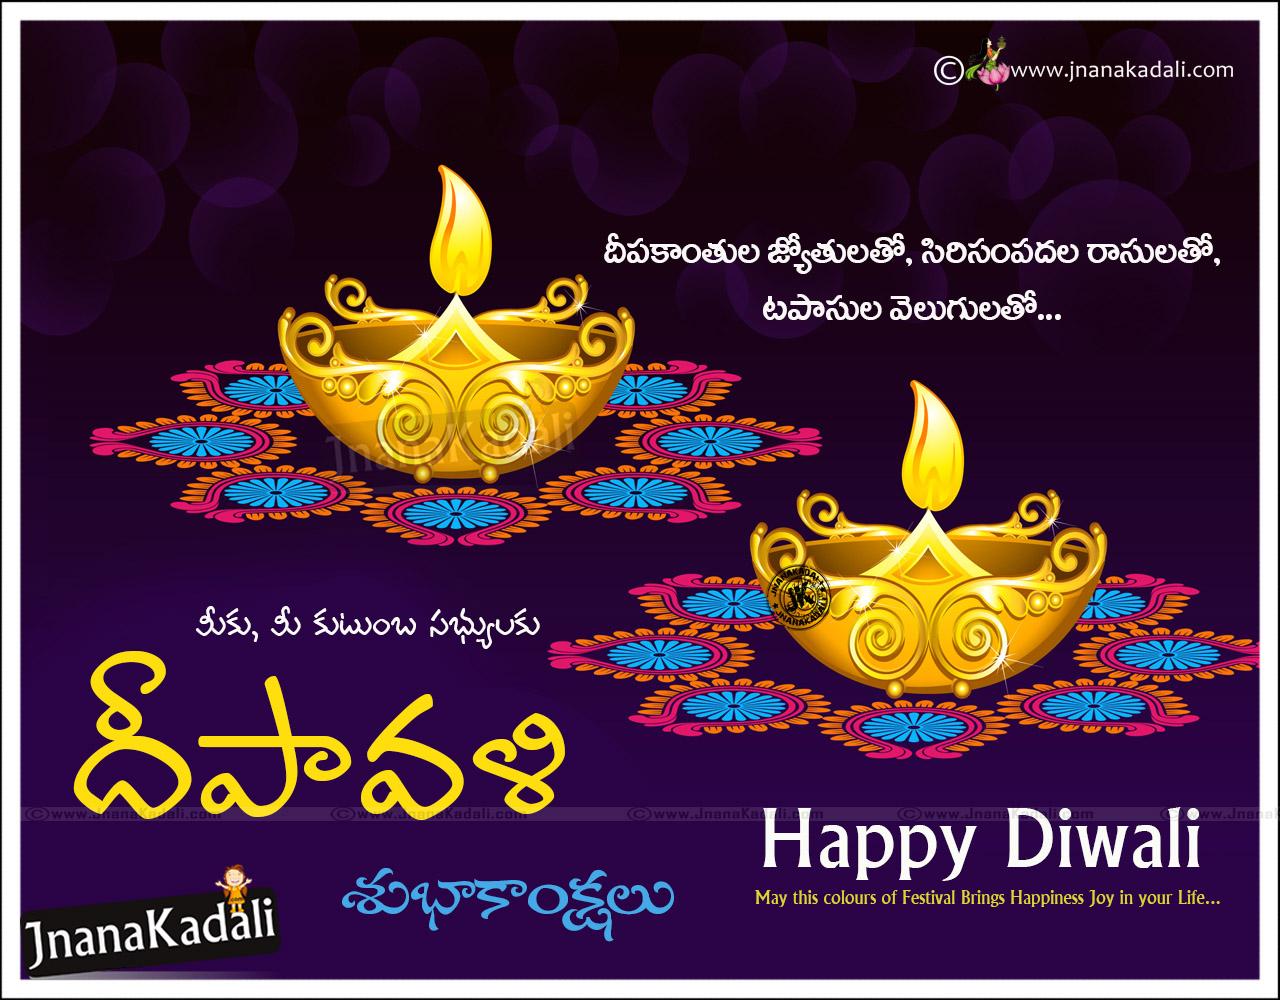 Latest telugu diwali quotes greetings online diwali 2016 hd diwali greetings with quotes in telugu online diwali greetings with hd wallpapers diwali diya kristyandbryce Gallery